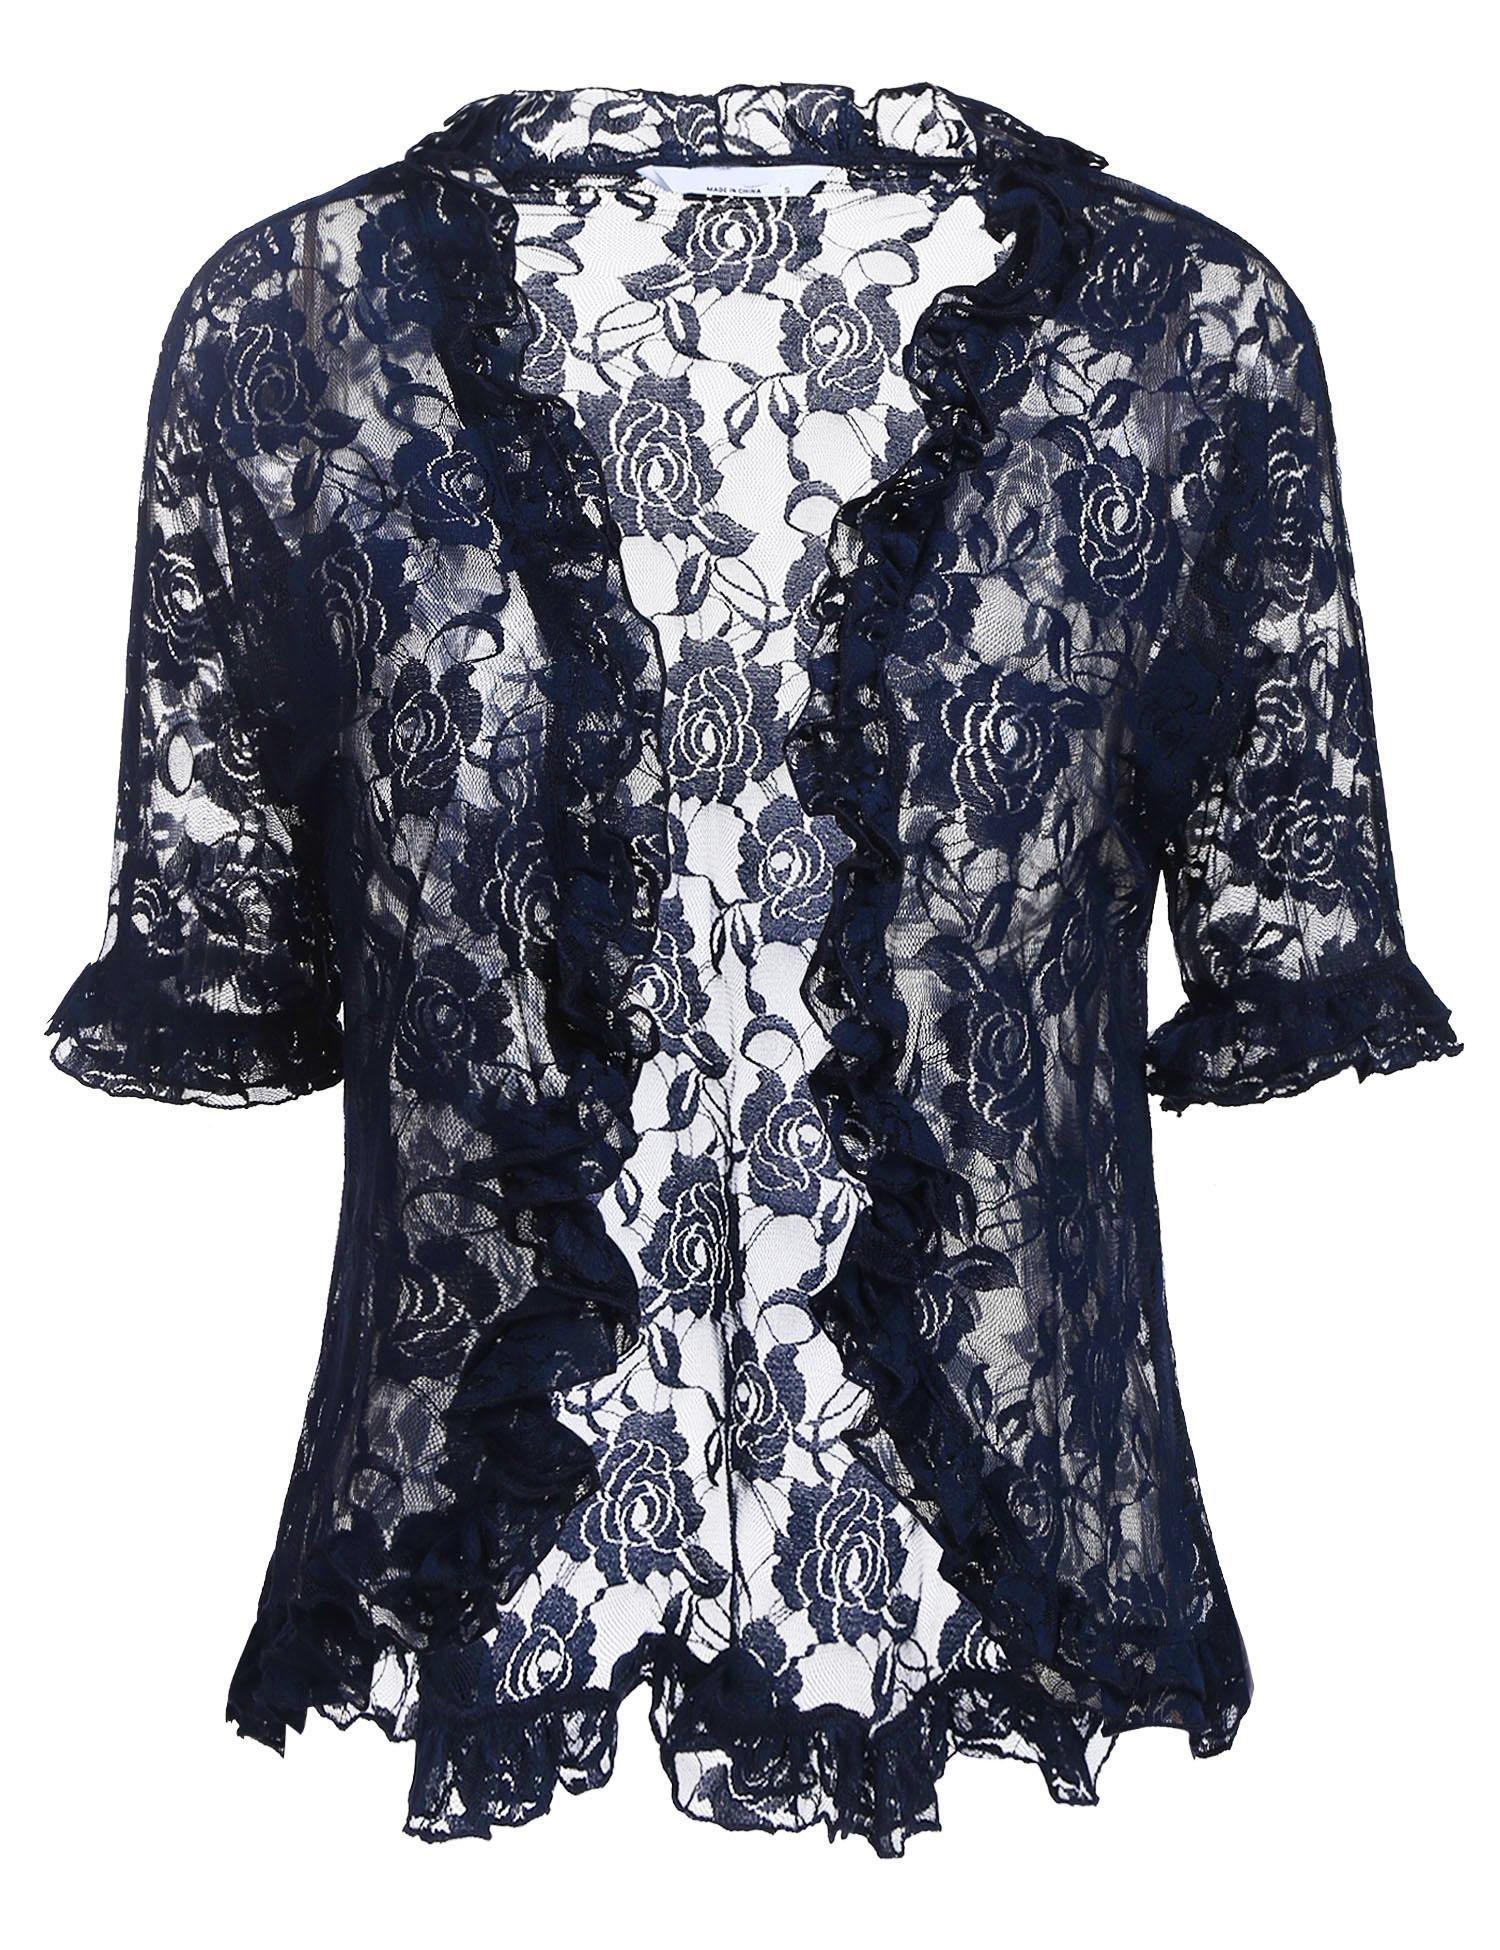 ELESOL Women's Solid Soft Stretch Party Bolero Shrug Retro Style Open Cardigan Navy Blue/XL